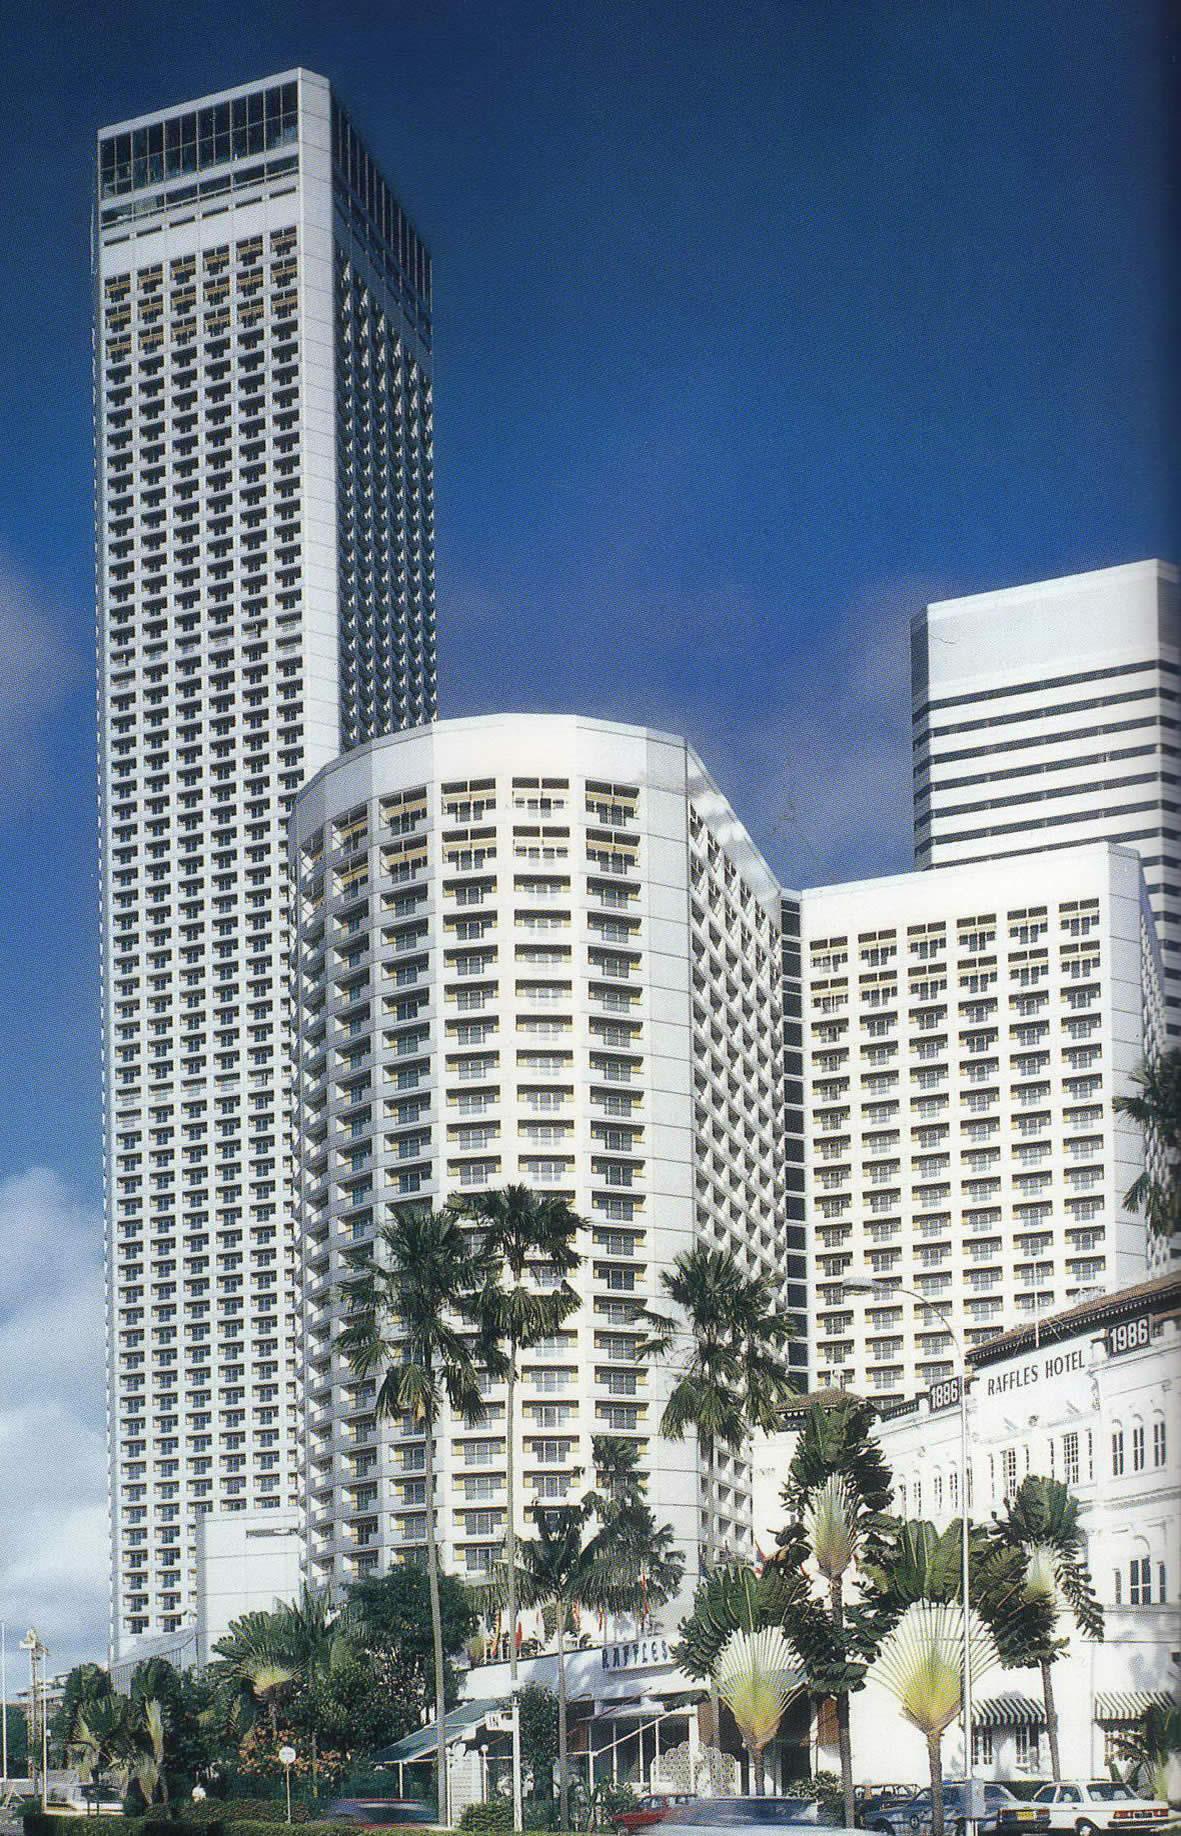 Westin stamford hotel singapore tallest wallpaper for Tallest hotel in singapore